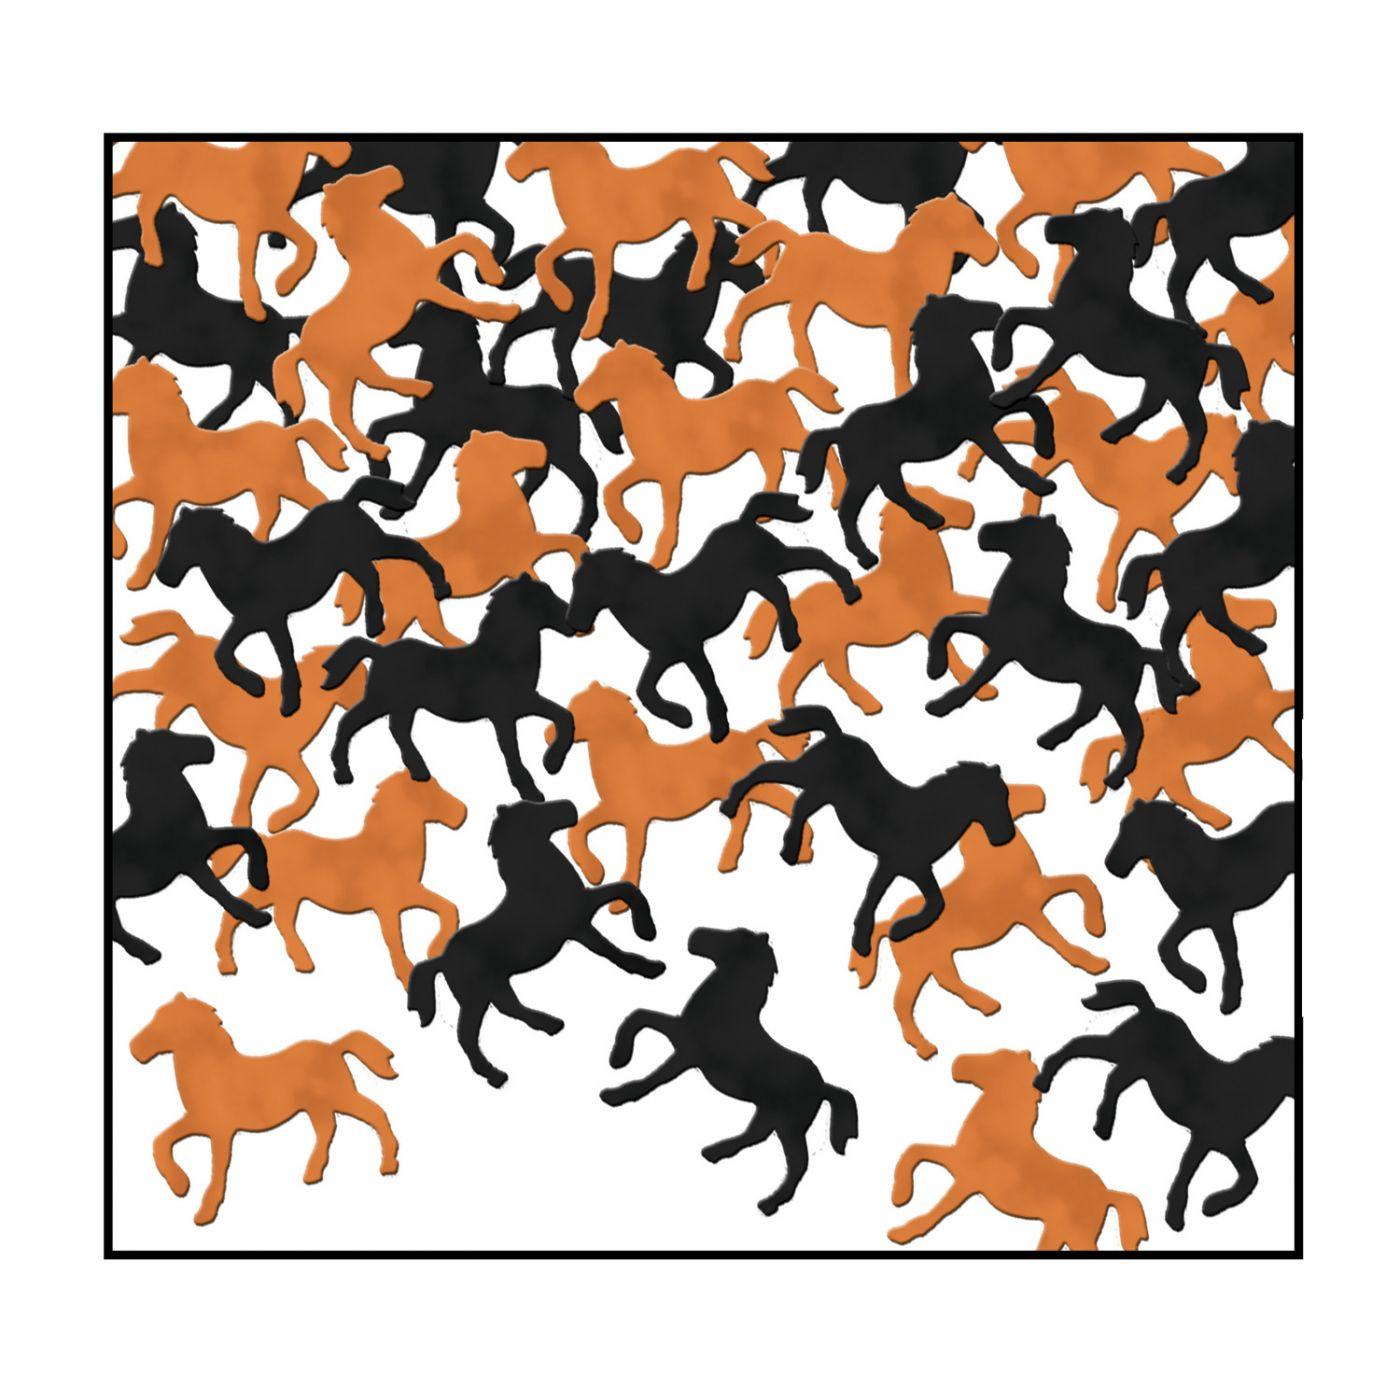 Fanci-Fetti Horses image